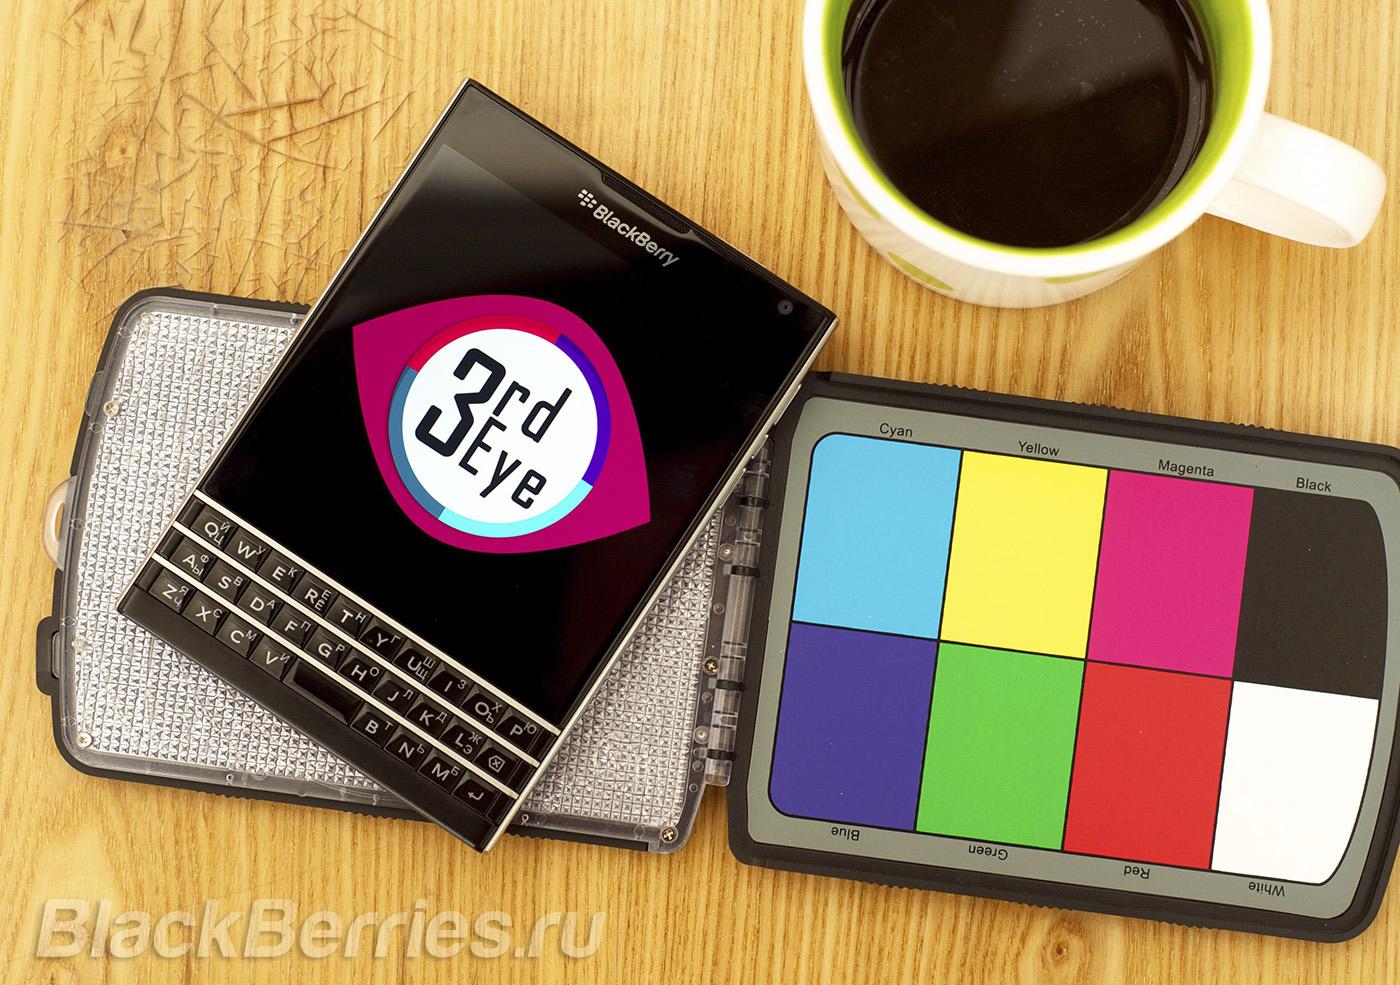 BlackBerry-Beta-Zone-20-07-3